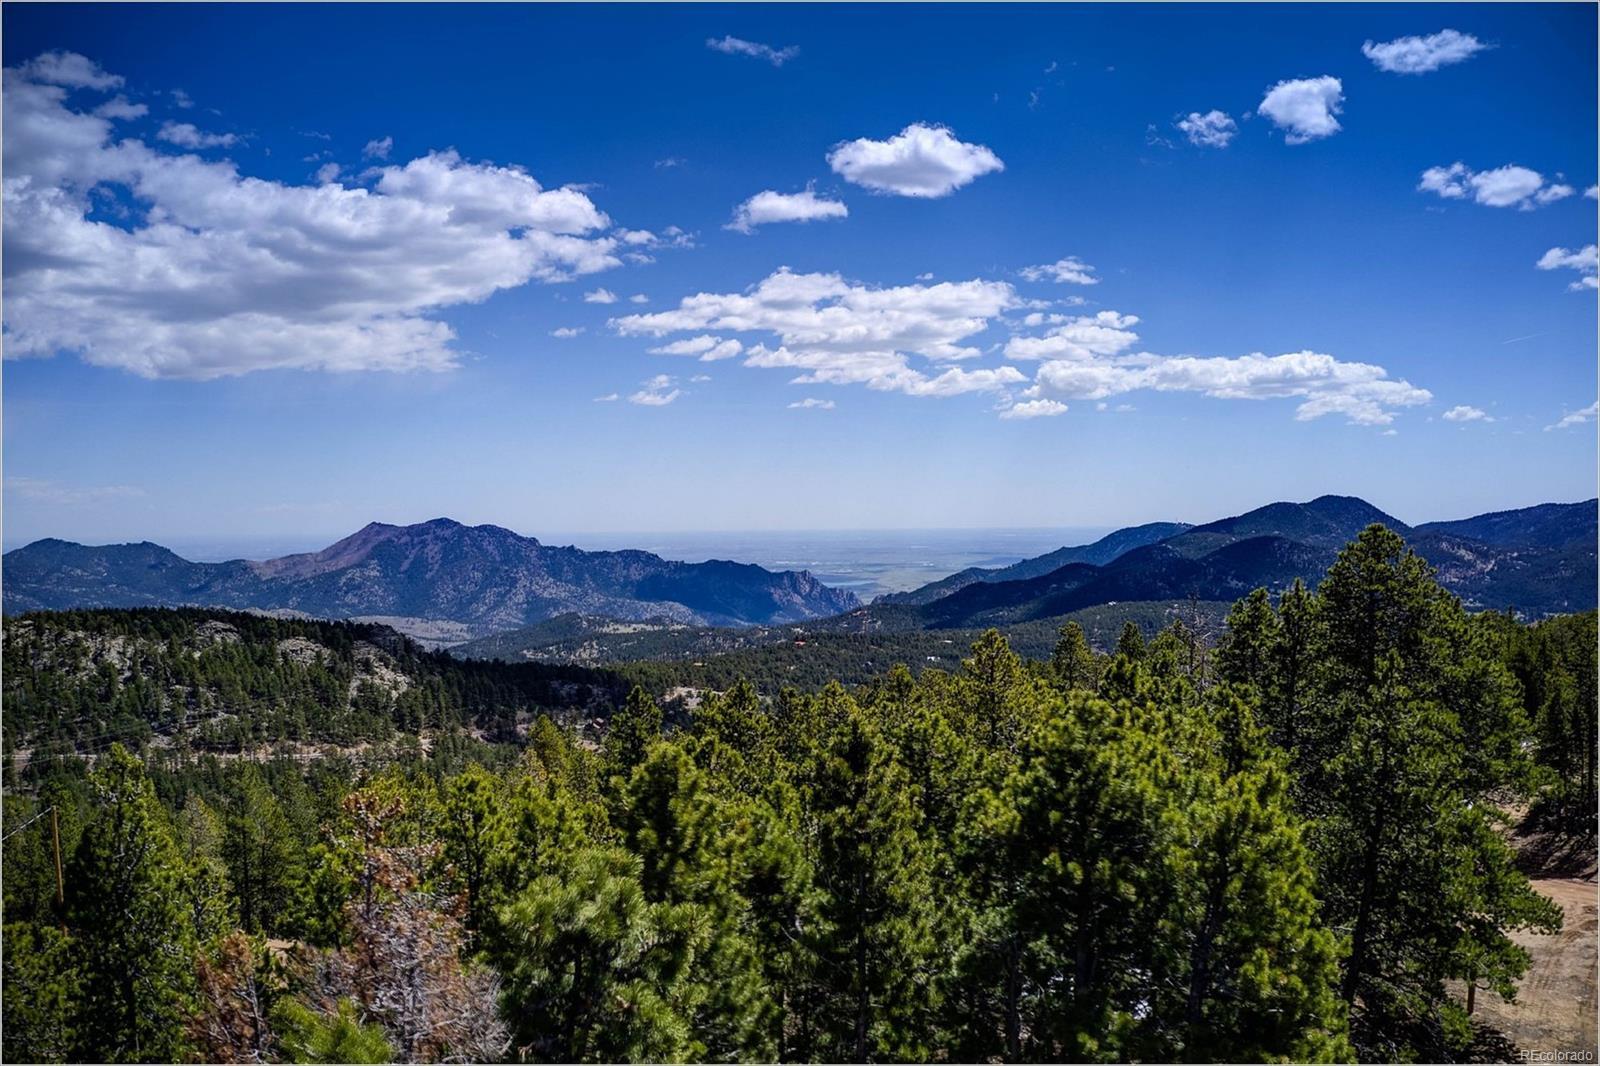 712 Divide View Drive, Golden, CO 80403 - Golden, CO real estate listing